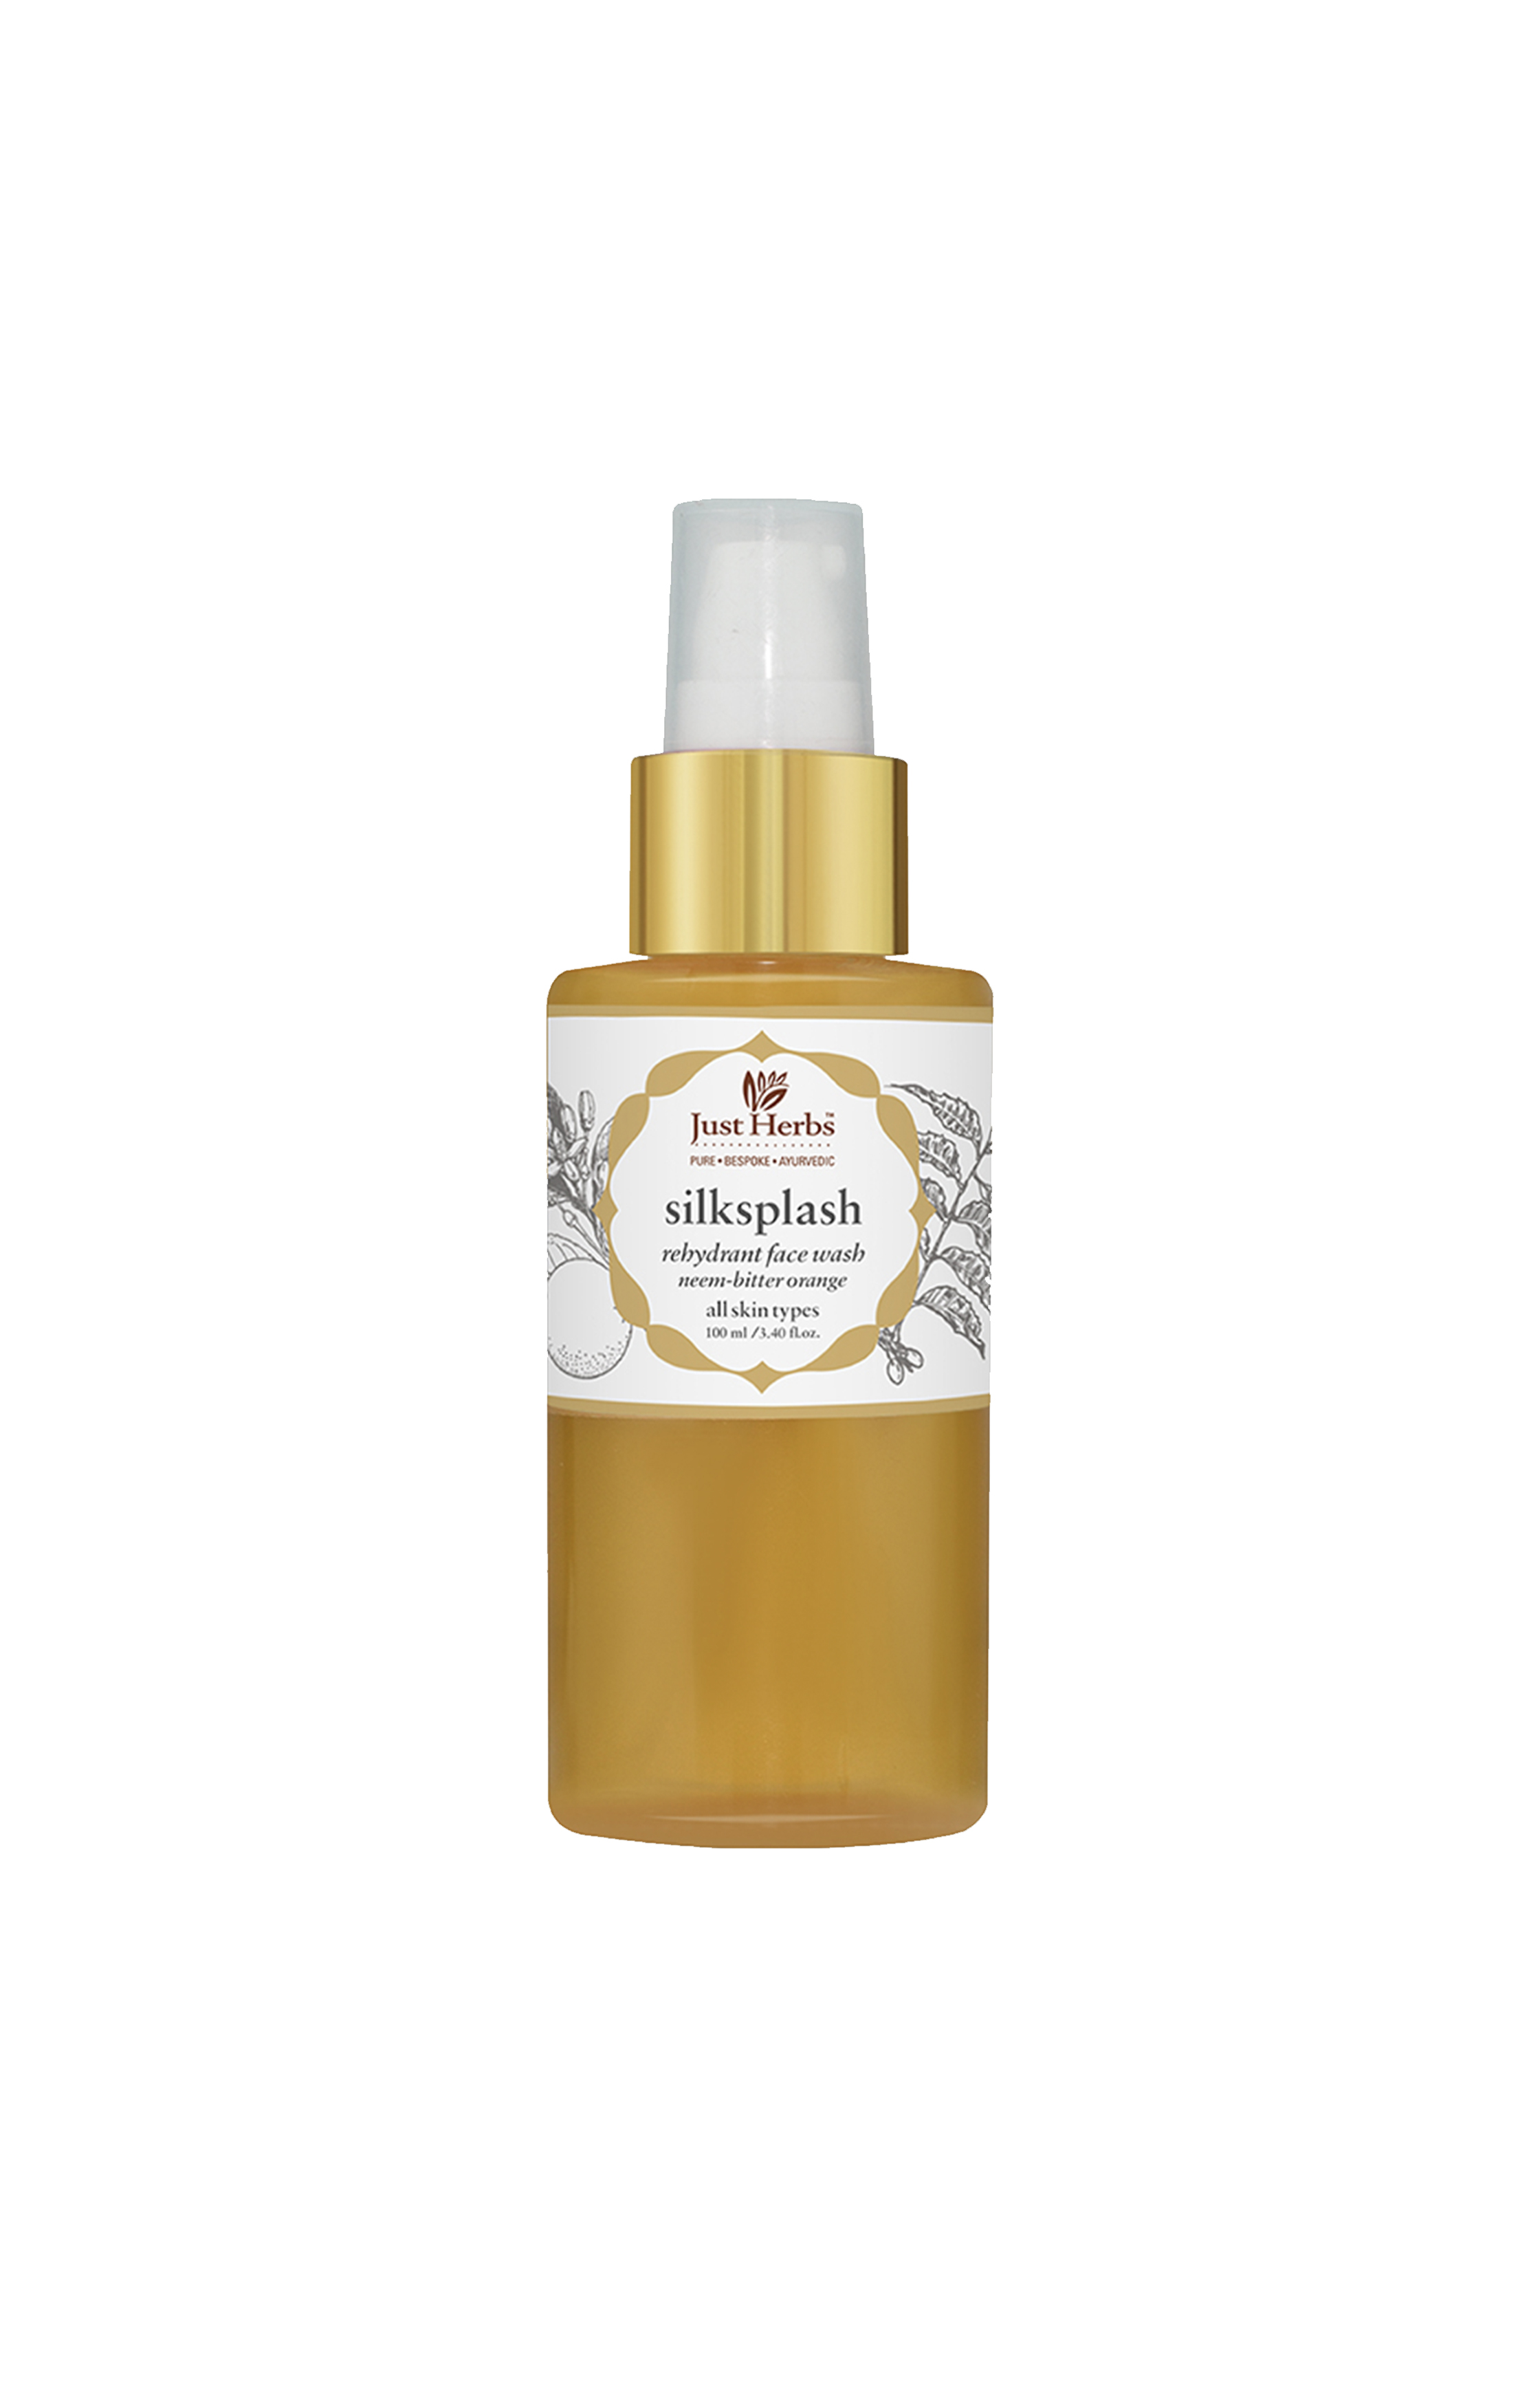 Just Herbs | Silksplash Rehydrant Face Wash 100ml